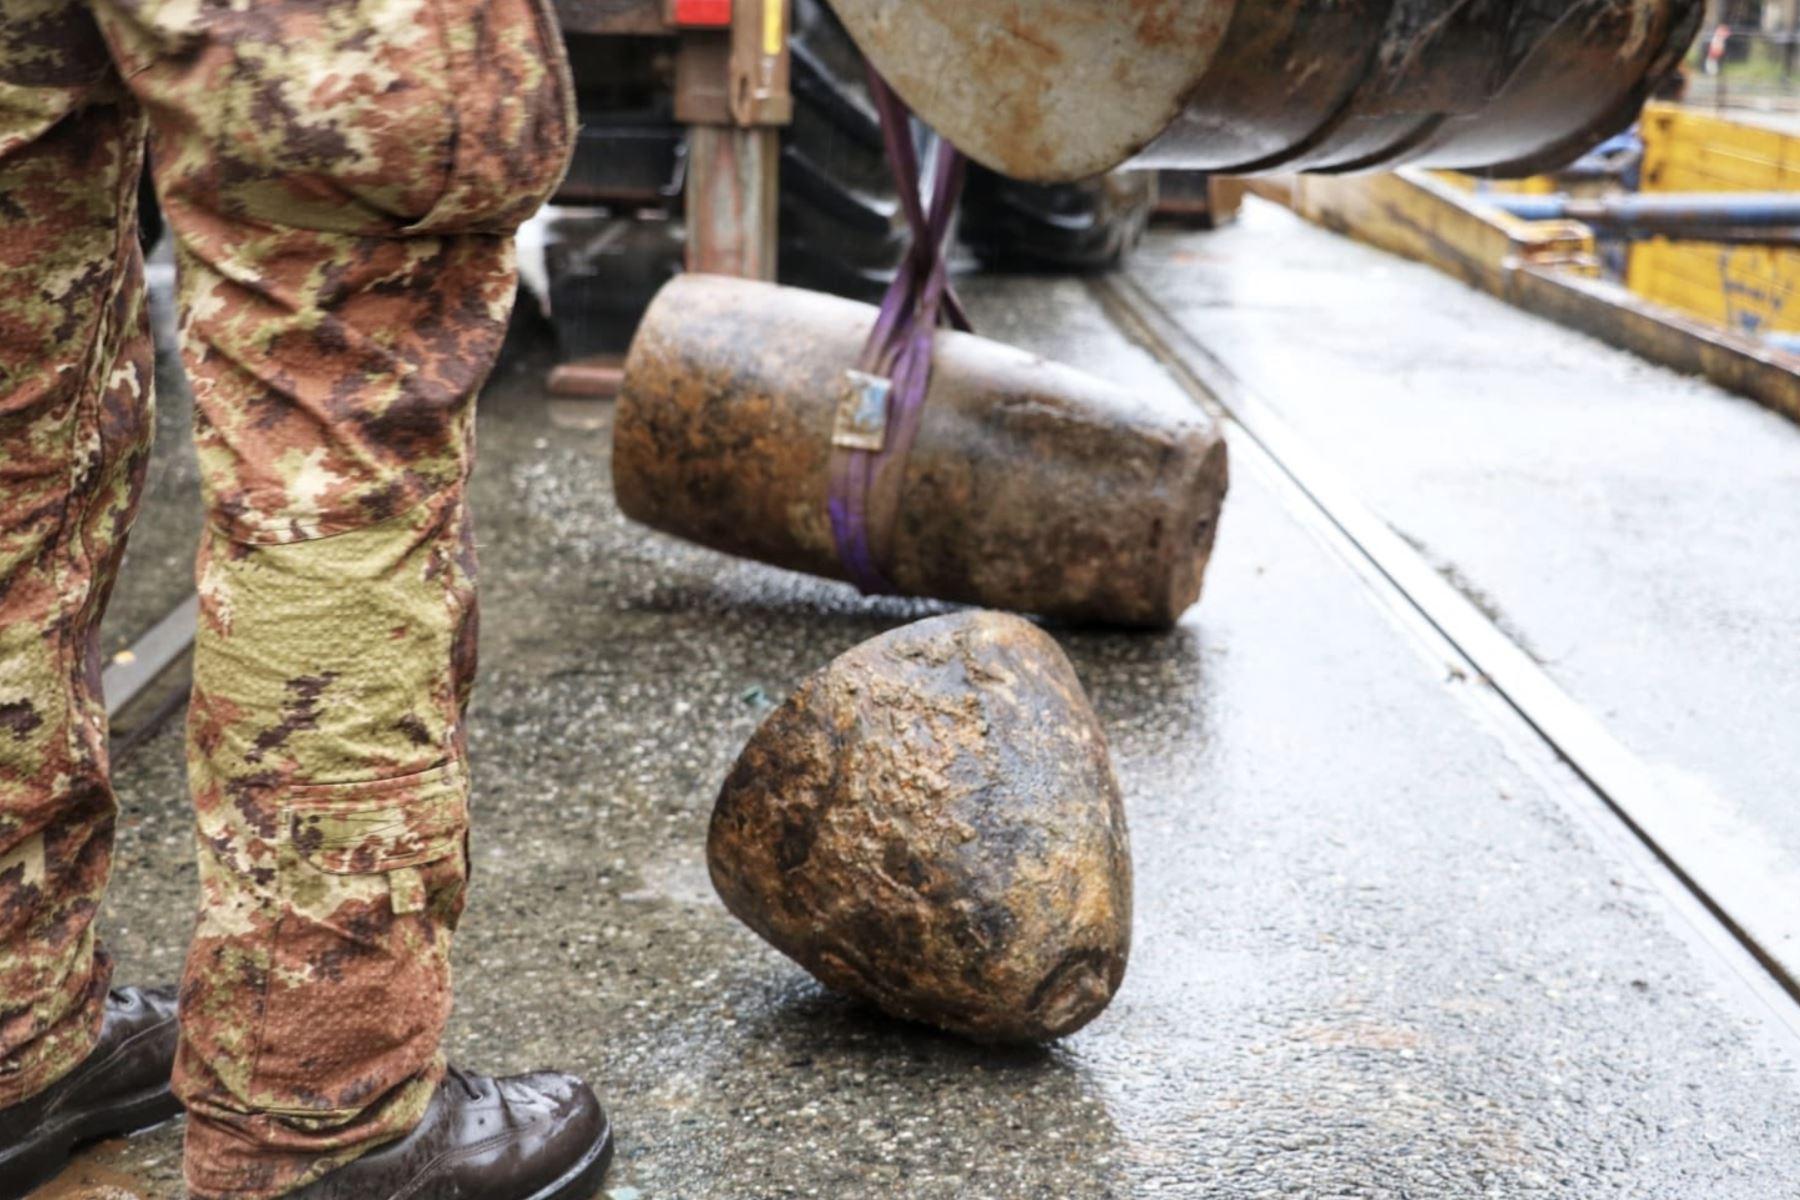 Hallan bomba de la segunda guerra mundial en Turín. Foto: Twitter Ejercito Italiano